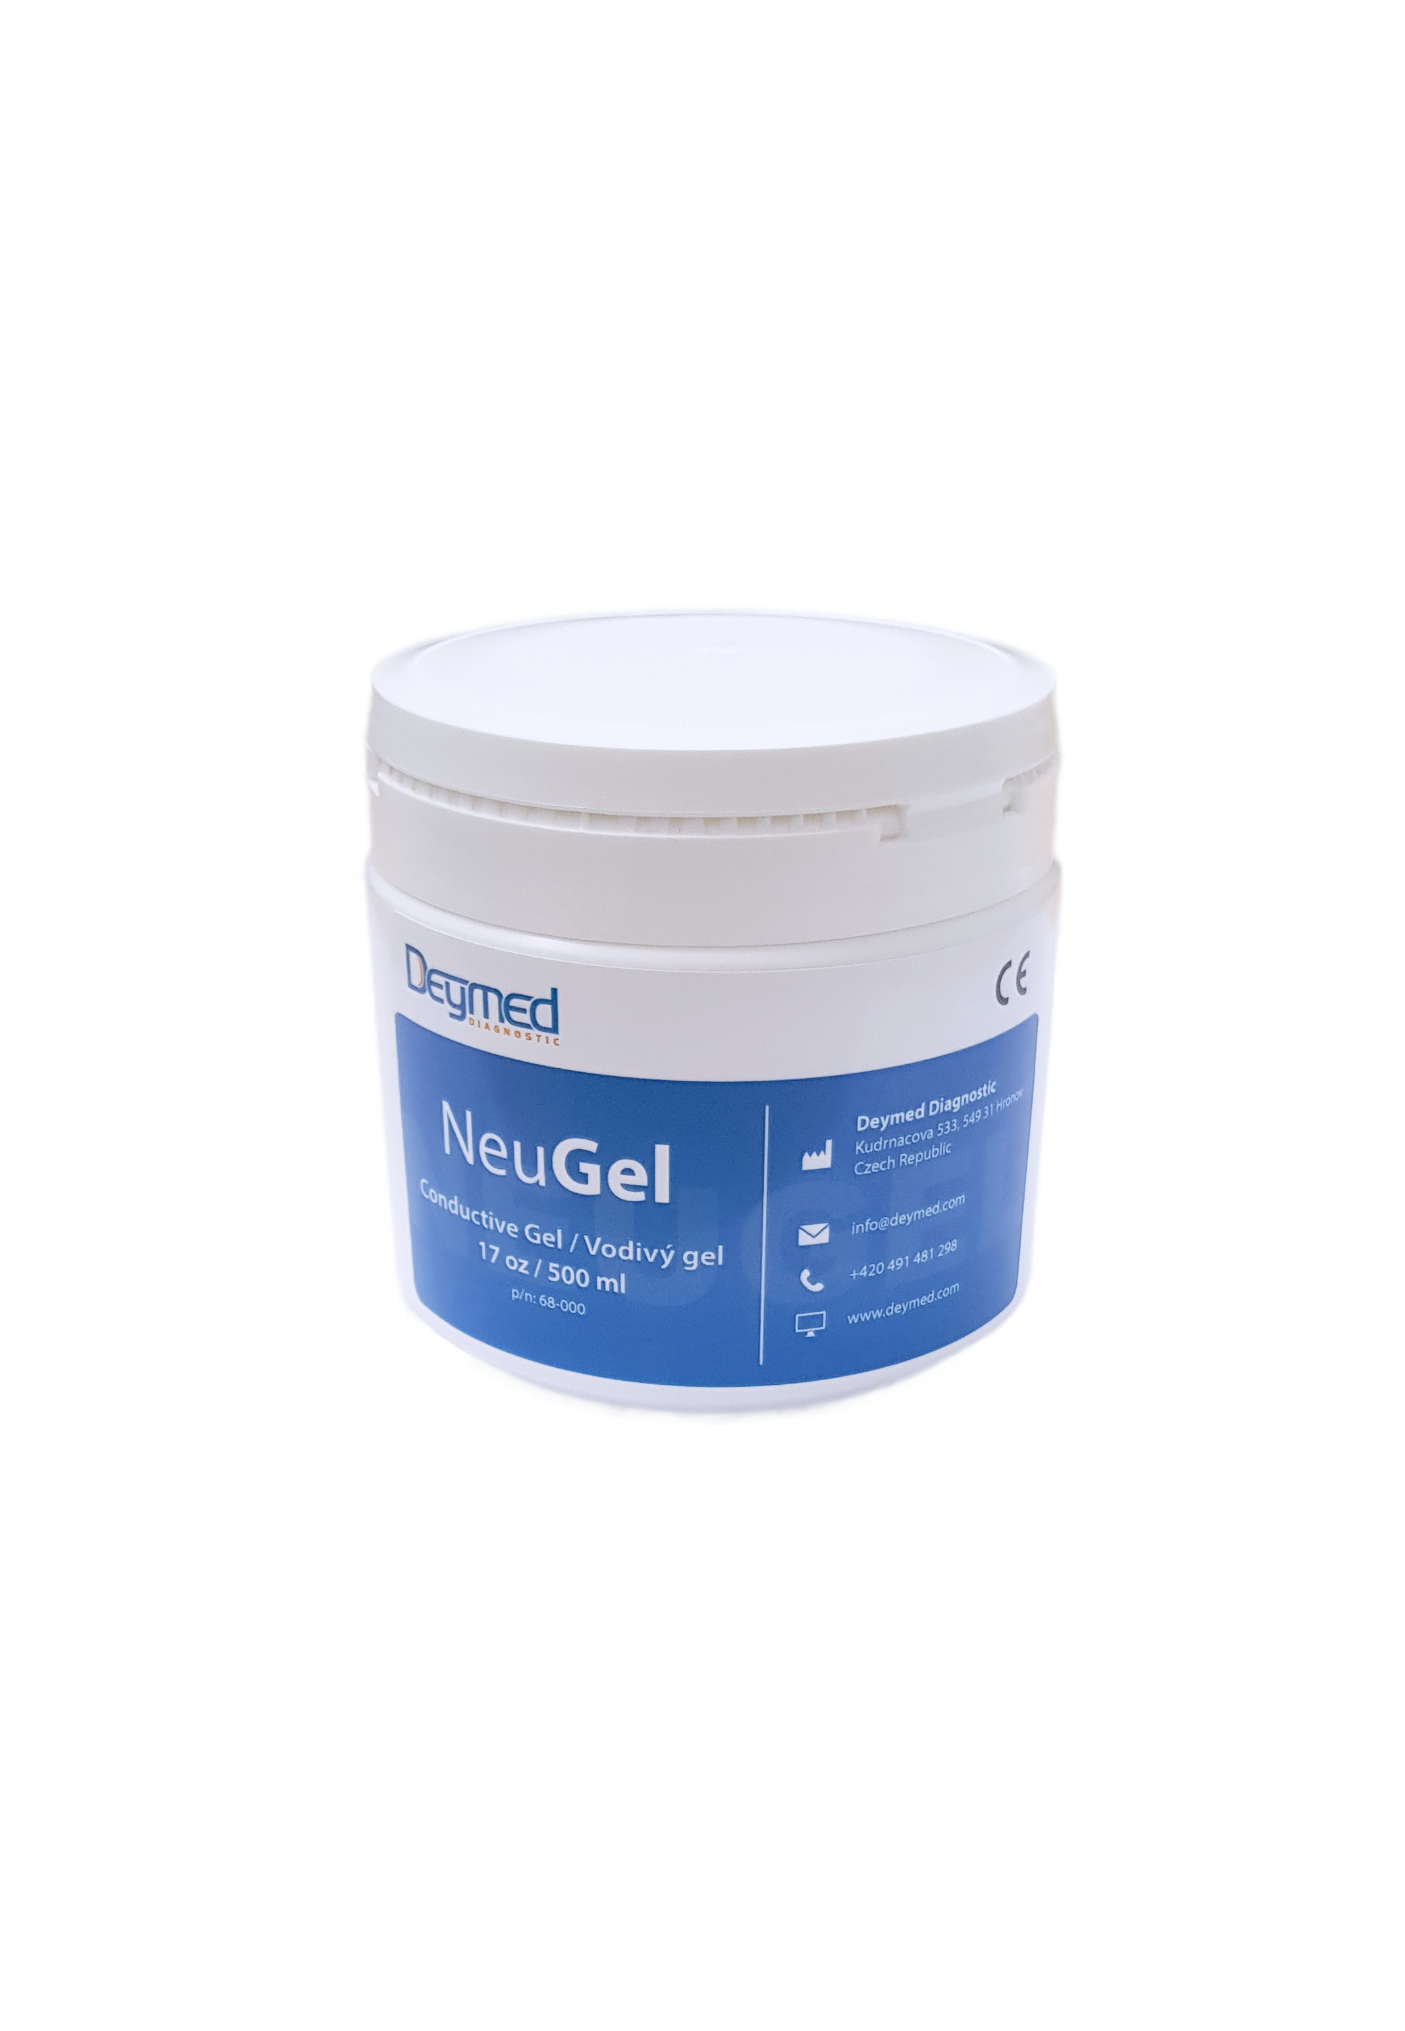 NeuGEL - EEG elektrovodivý gel Deymed: 500ml (17 oz)